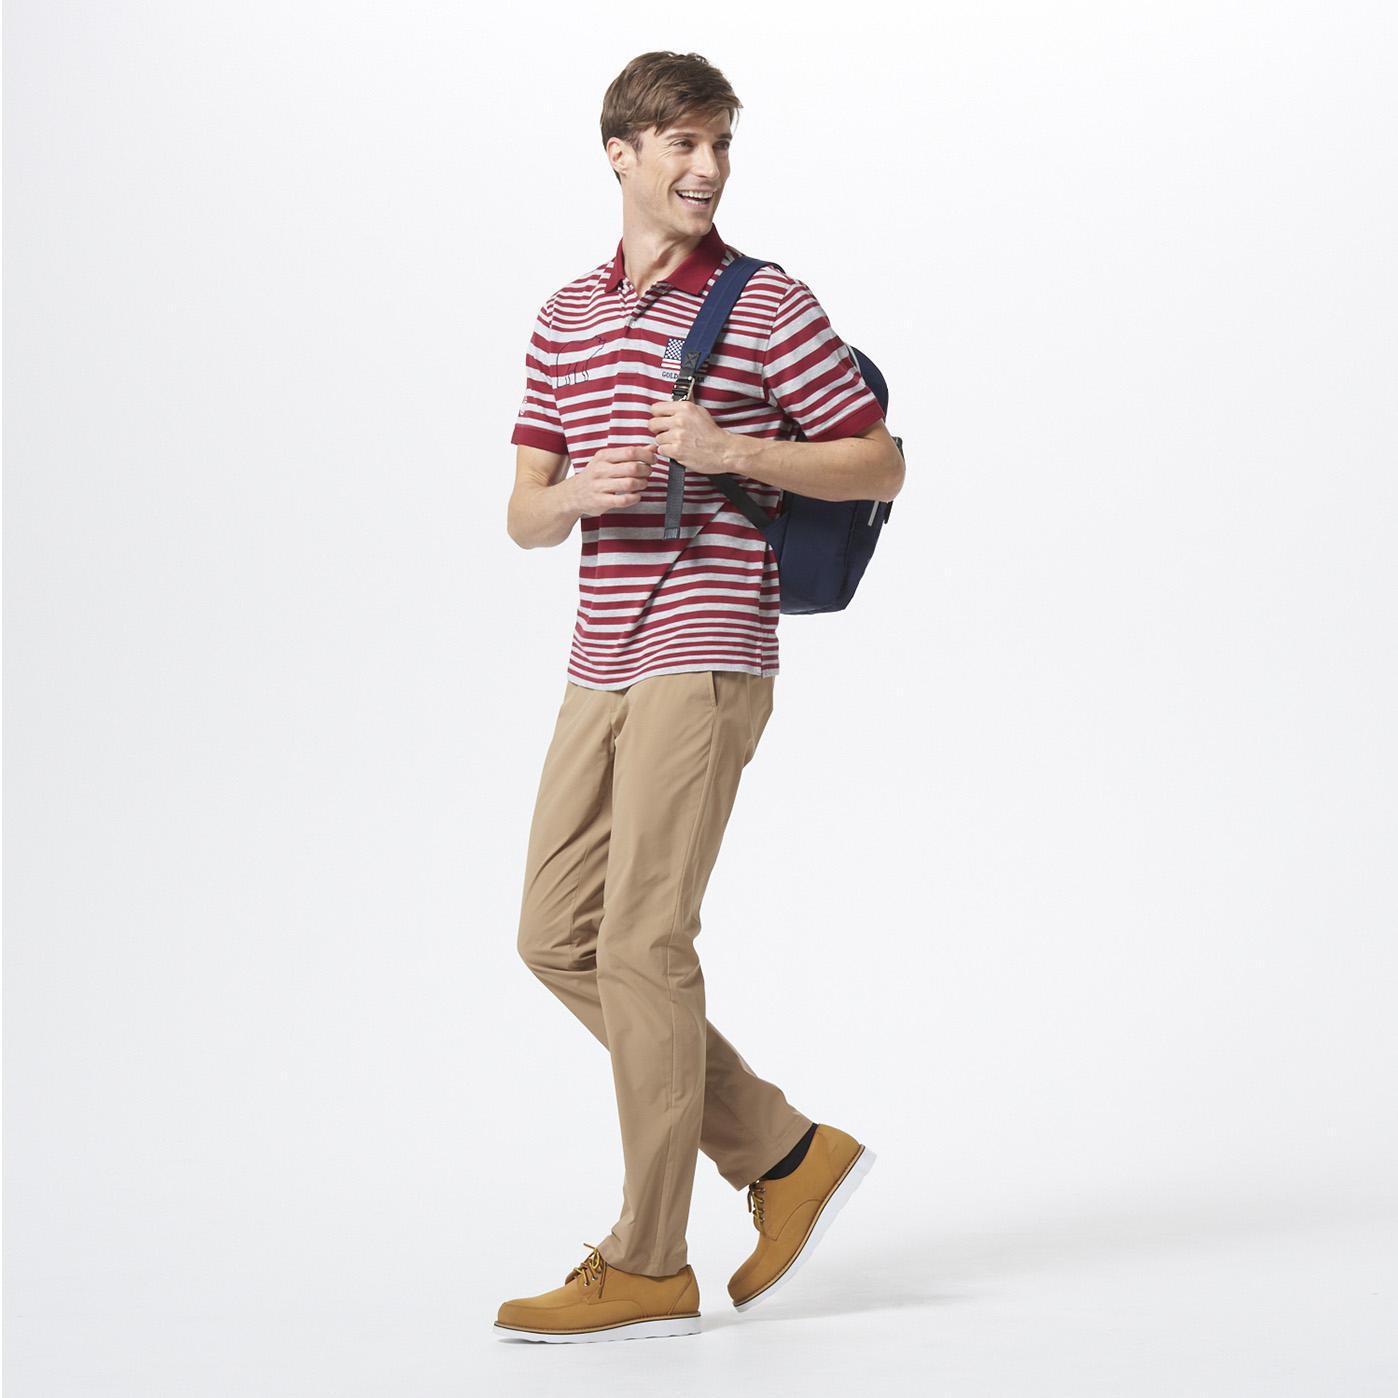 【Golden Bear Mens】<br/>ポロシャツを使ったスポーティなスタイリング